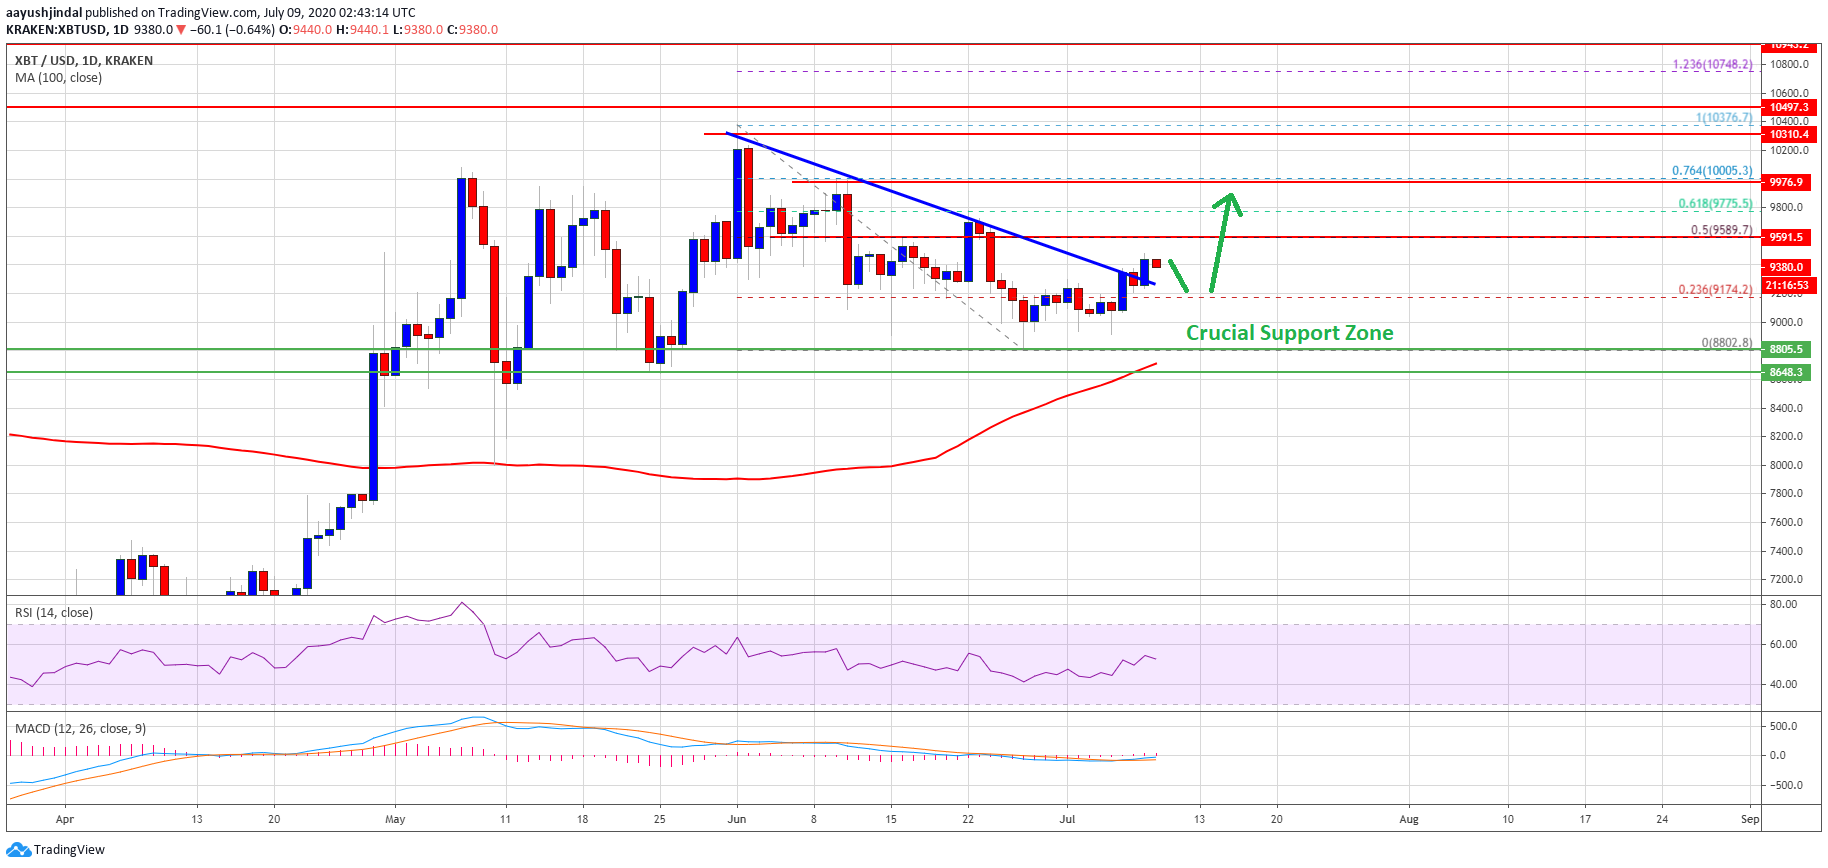 Bitcoin Daily Chart Indicates Crucial Bullish Breakout Towards $10,000